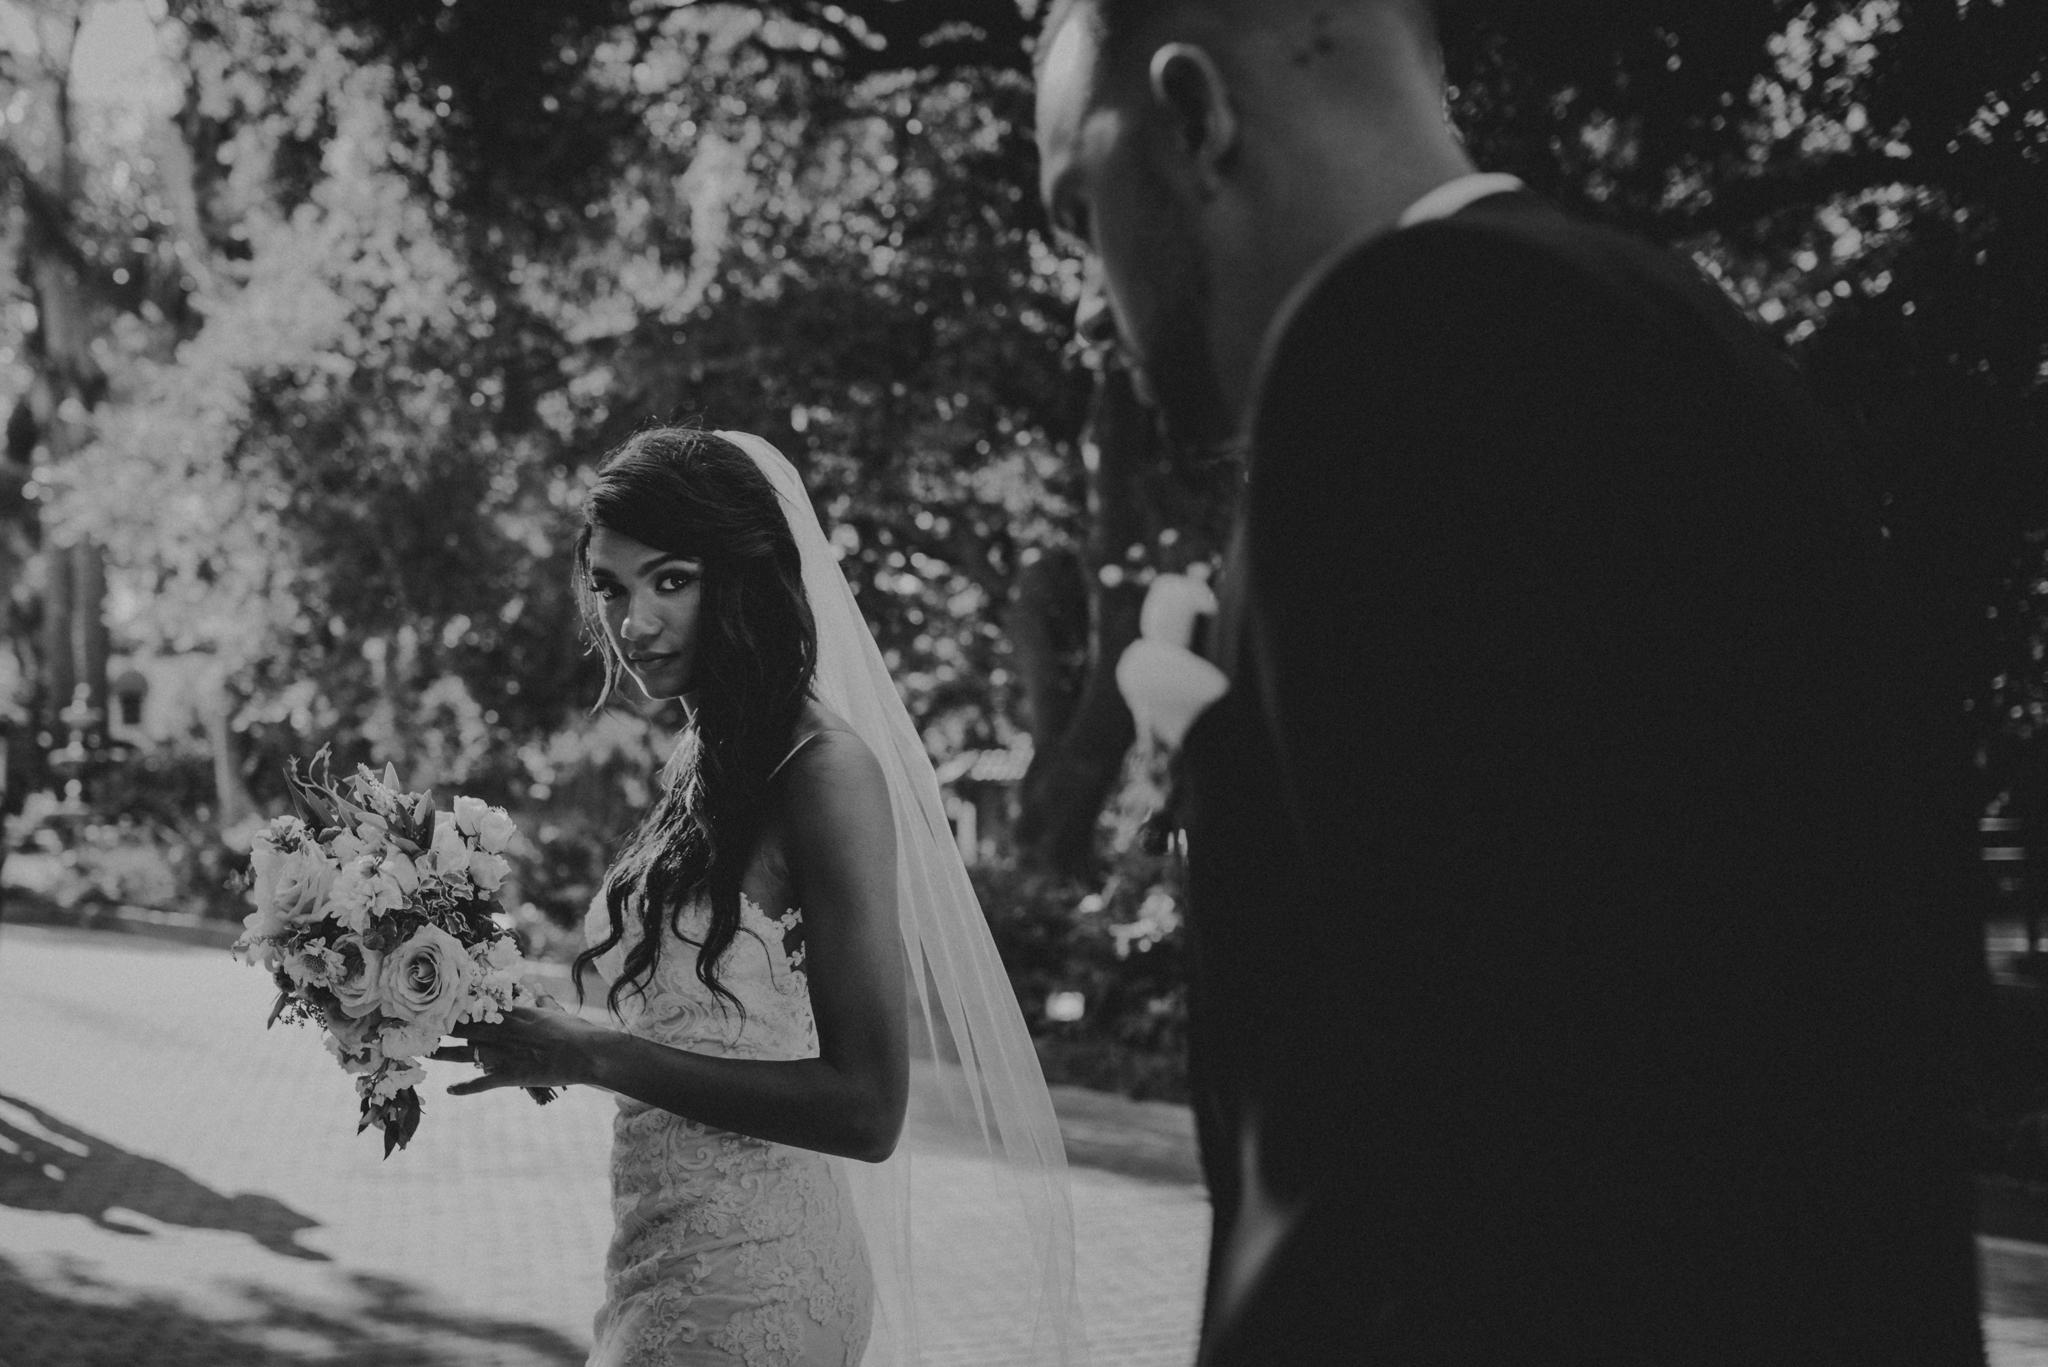 Isaiah + Taylor Photography - Rancho Las Lomas Wedding, Los Angeles Wedding Photographer-079.jpg